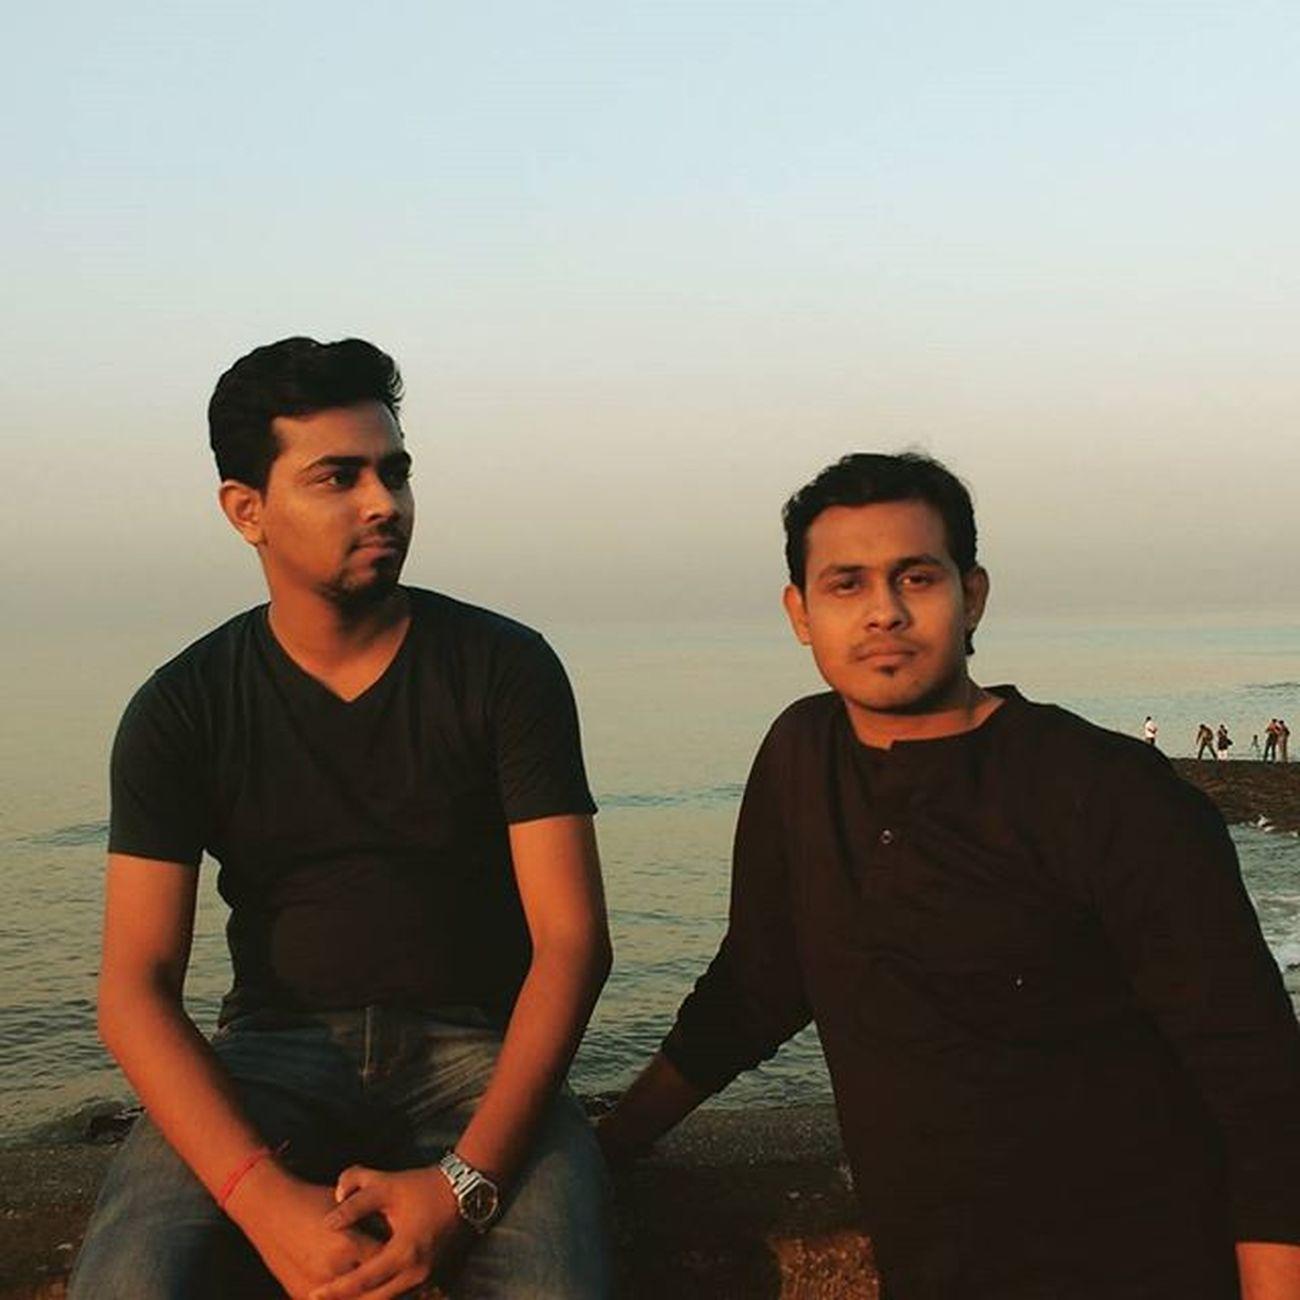 Dassaumen Saumendas Saumen Das Dass Sdas SD Sid People Photography Morningphotpgraphy Seaview Sea Funwithfriends Fun Bandra Bandraworlisealink Mumbai